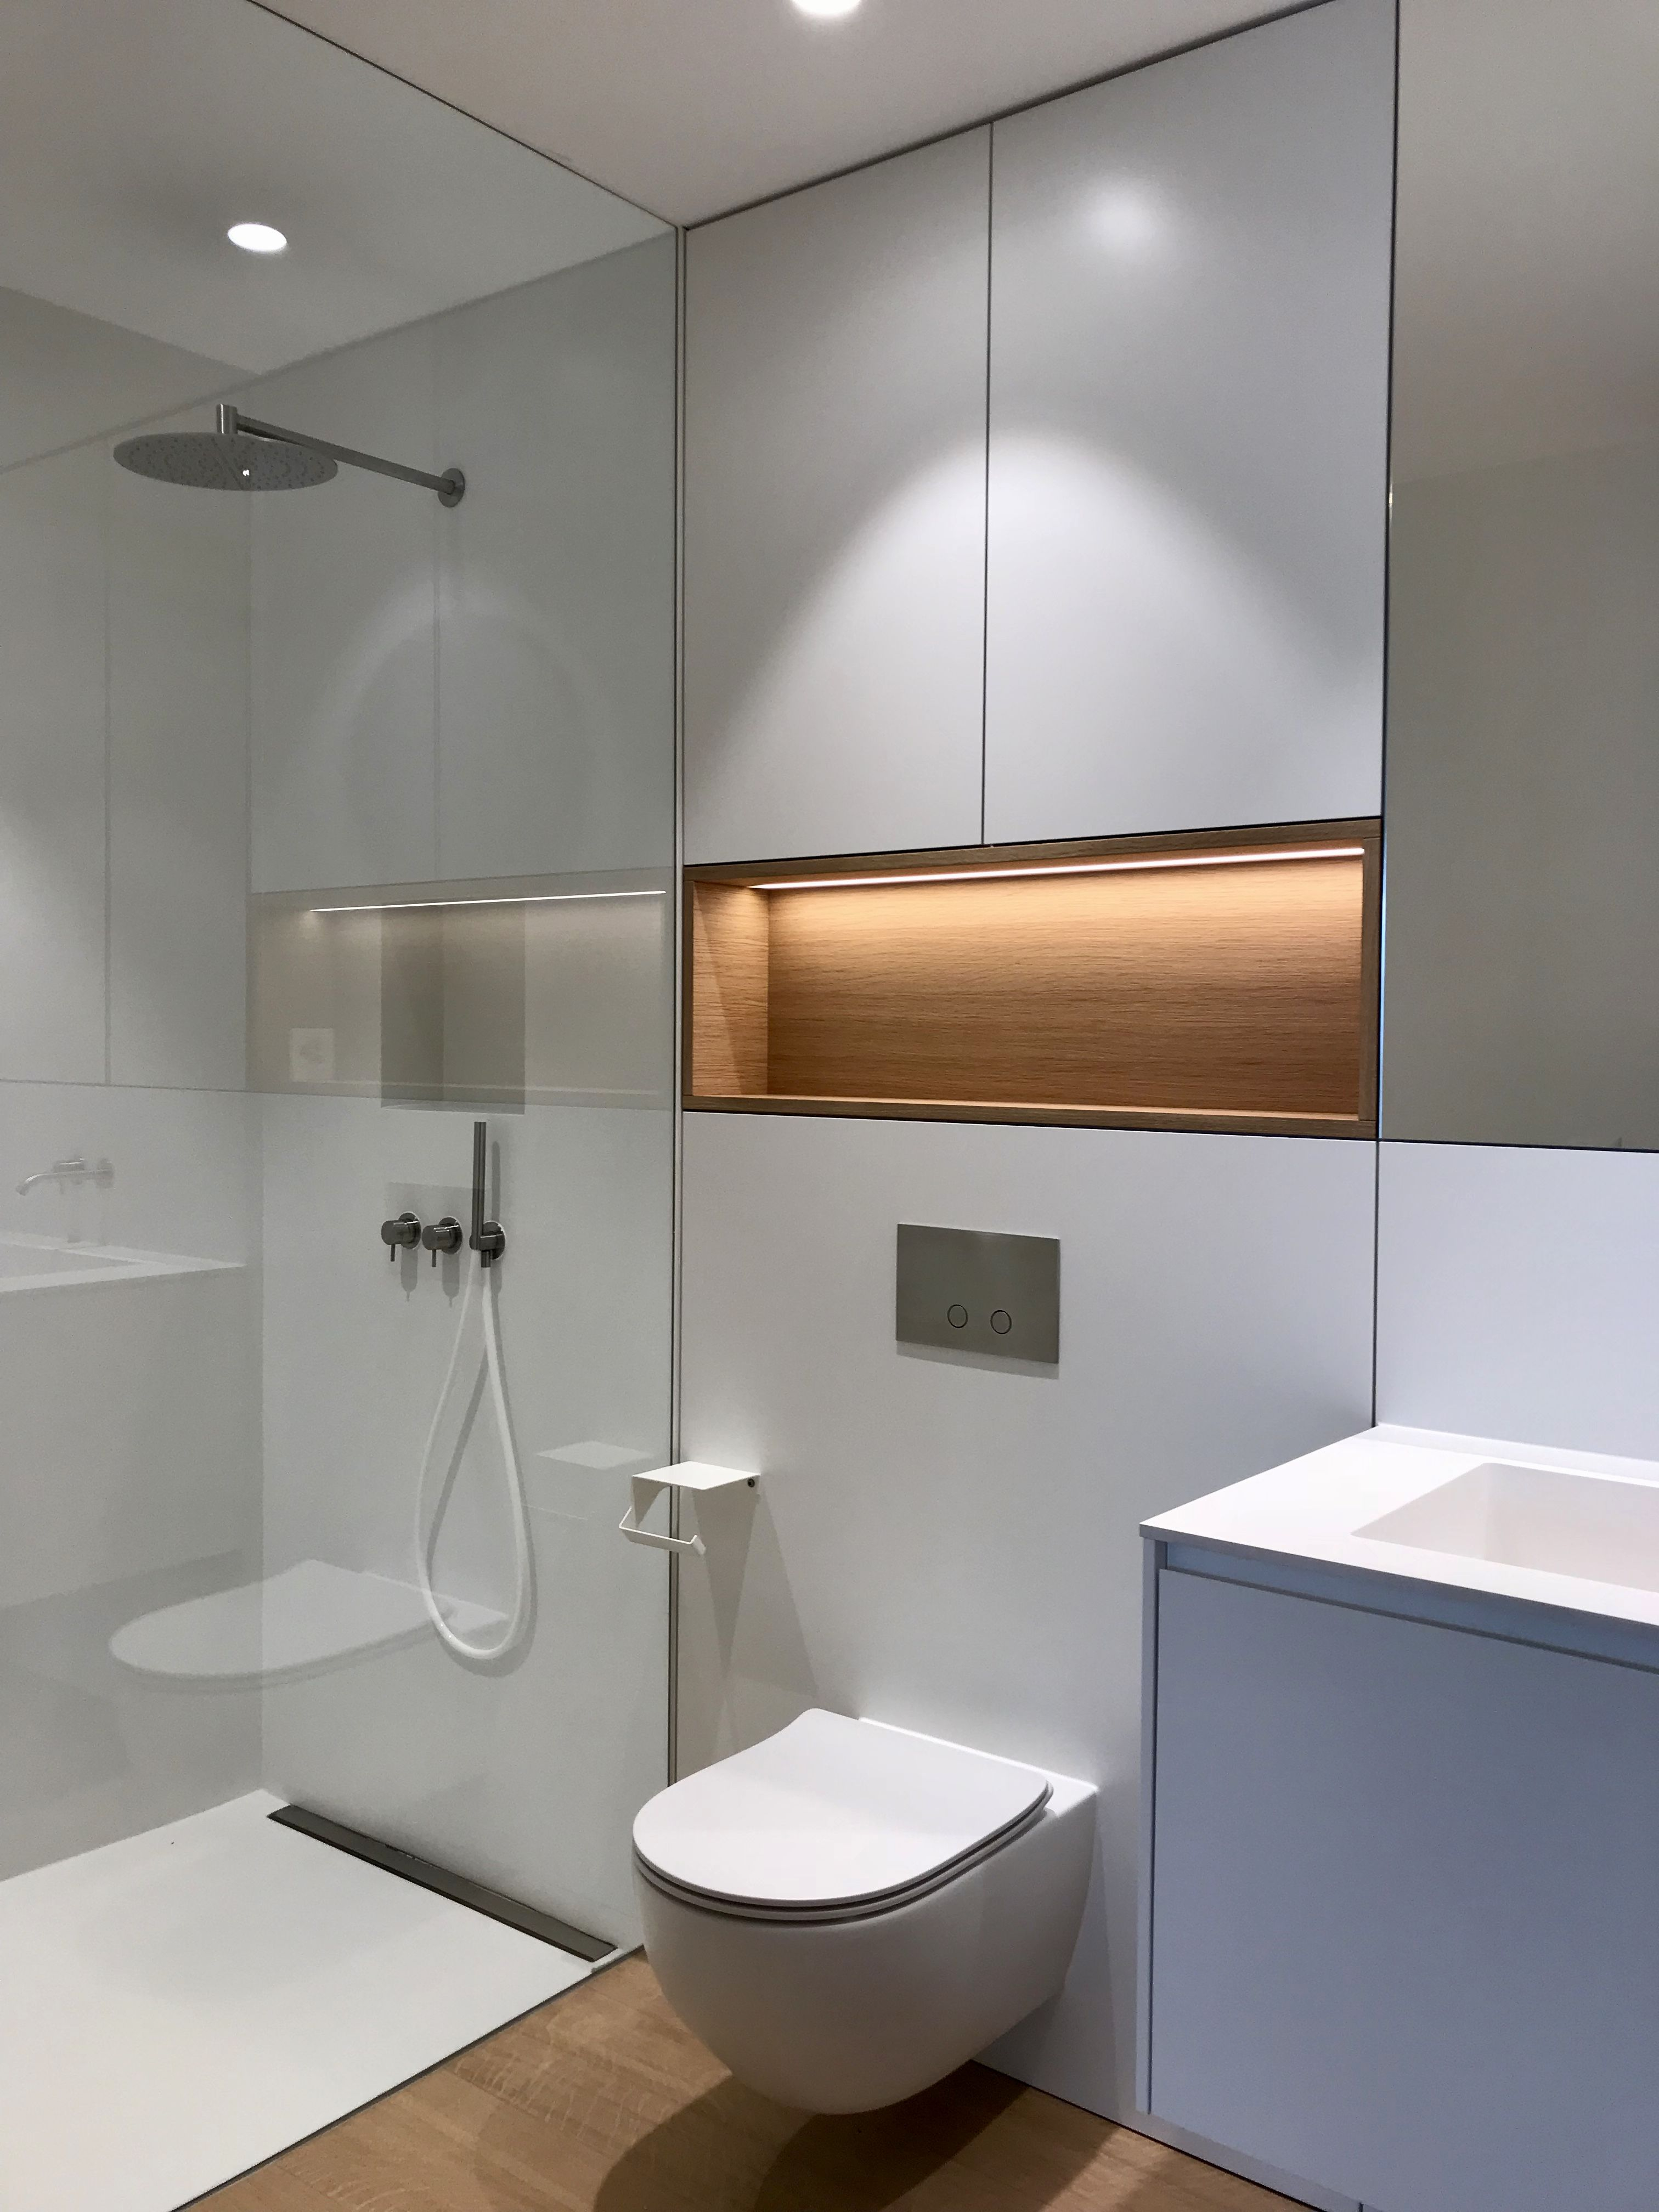 Innenarchitektur Und Innenausbau By Room42 Ch Bathroom Styling